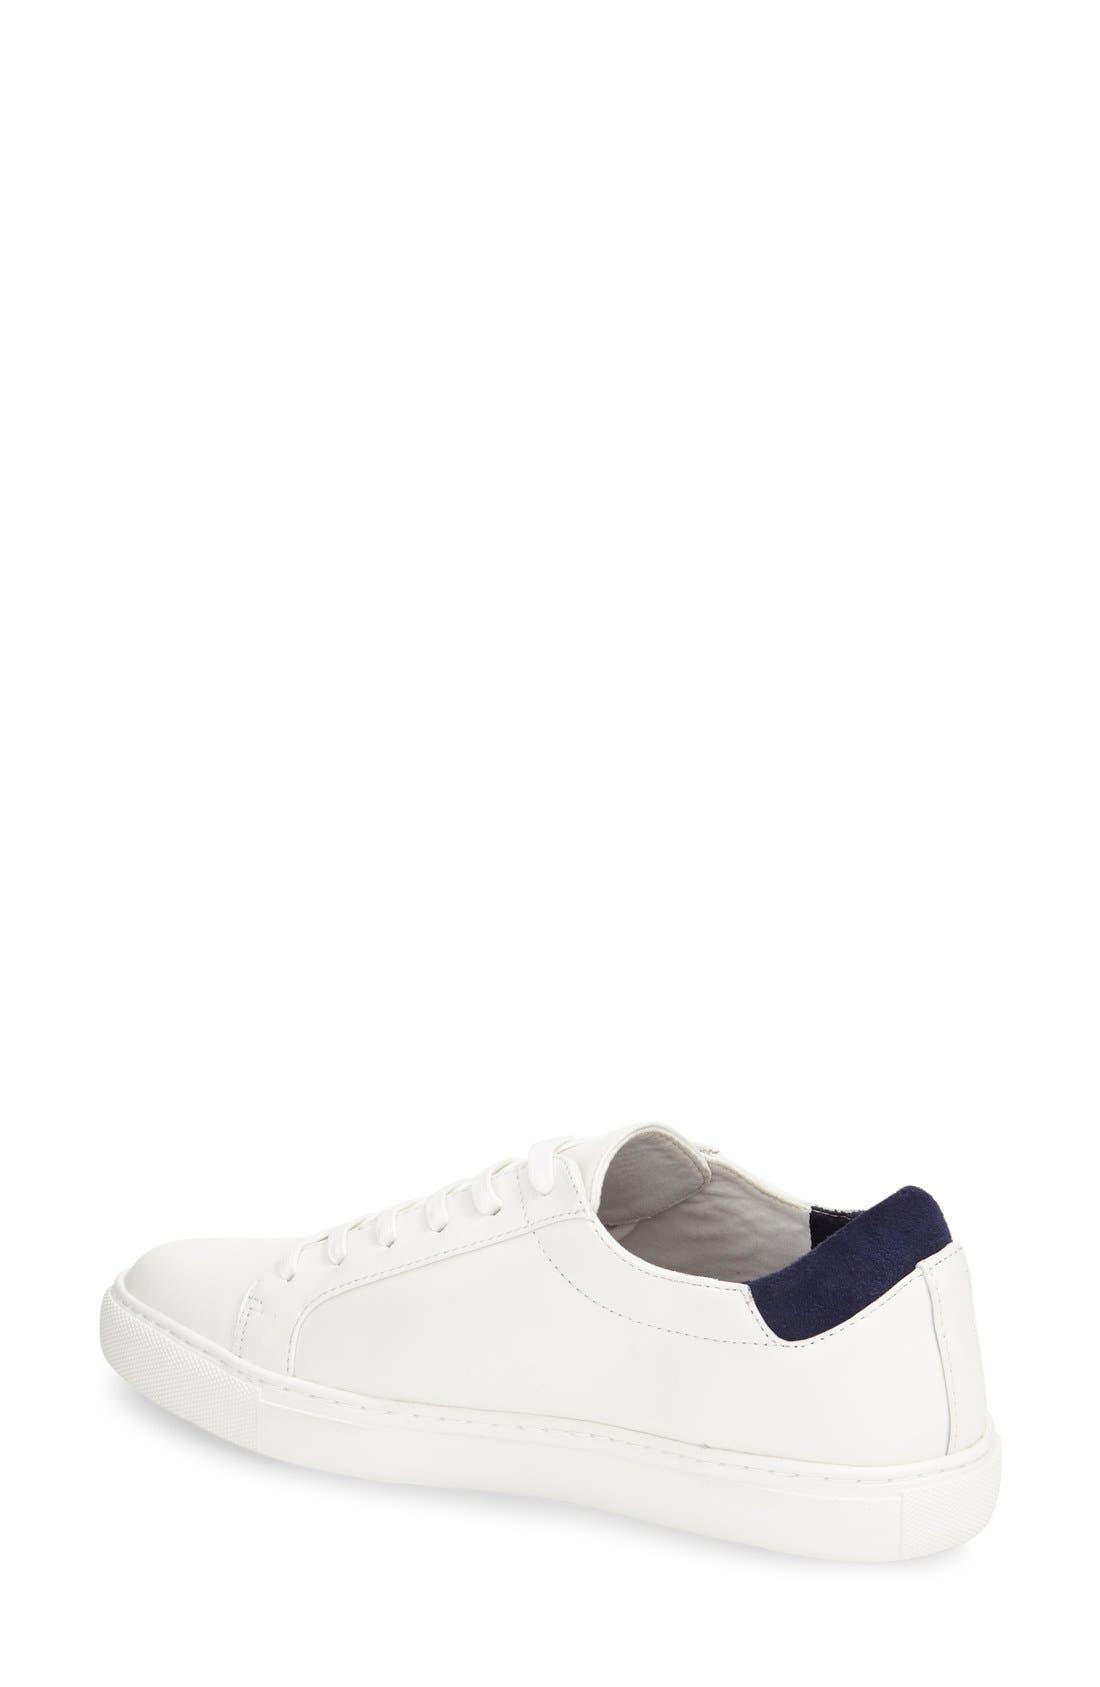 Alternate Image 2  - Kenneth Cole New York 'Kam' Sneaker (Women)